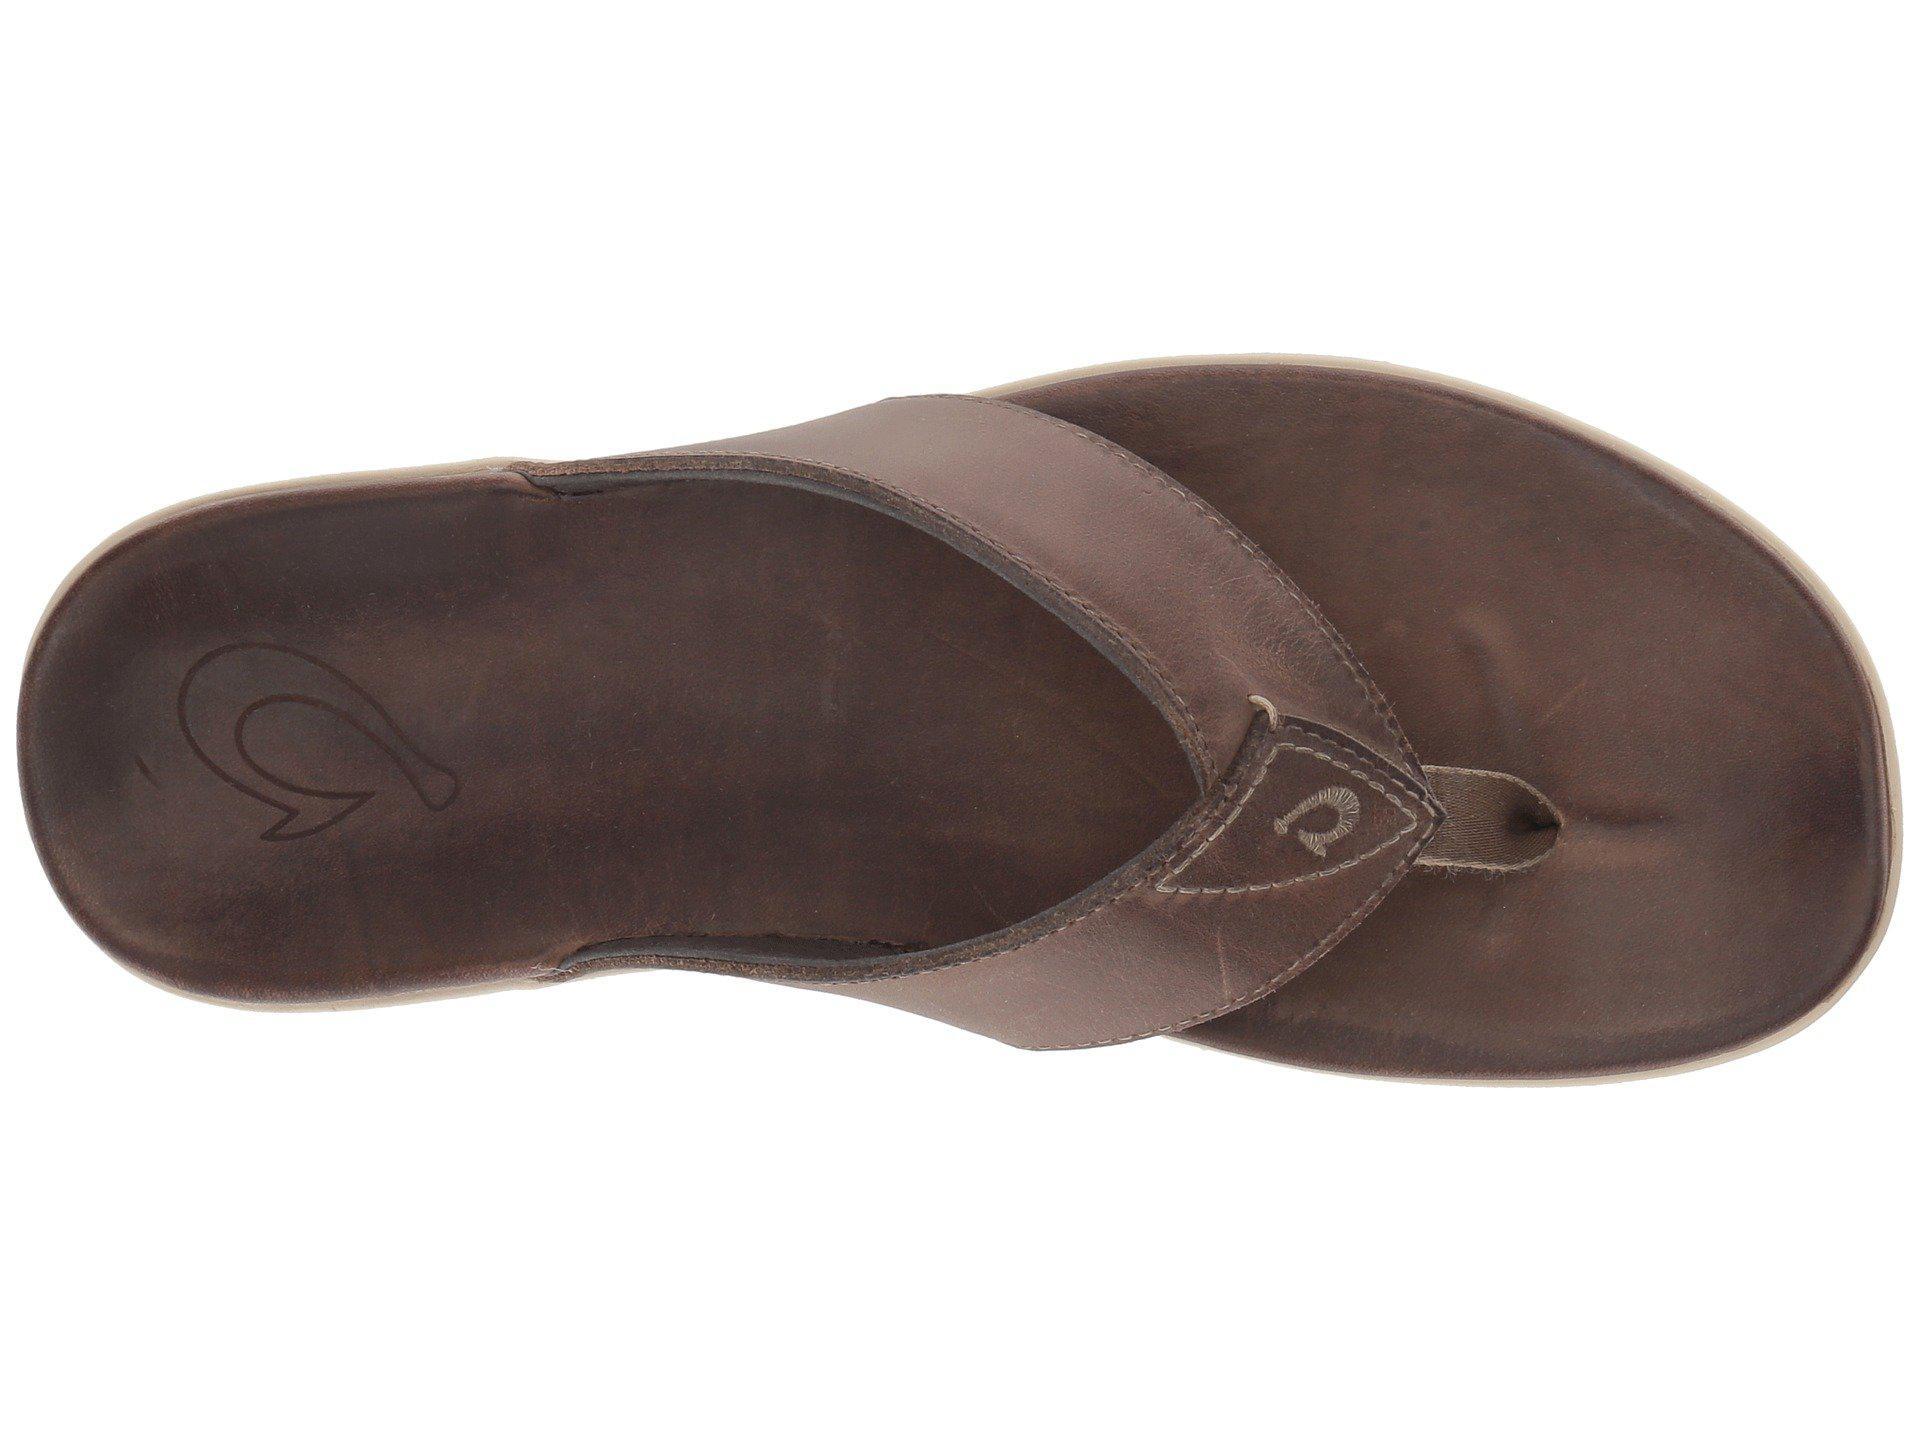 663a5a4e6f0f Lyst - Olukai Nalukai Sandal (husk husk) Men s Shoes in Brown for Men